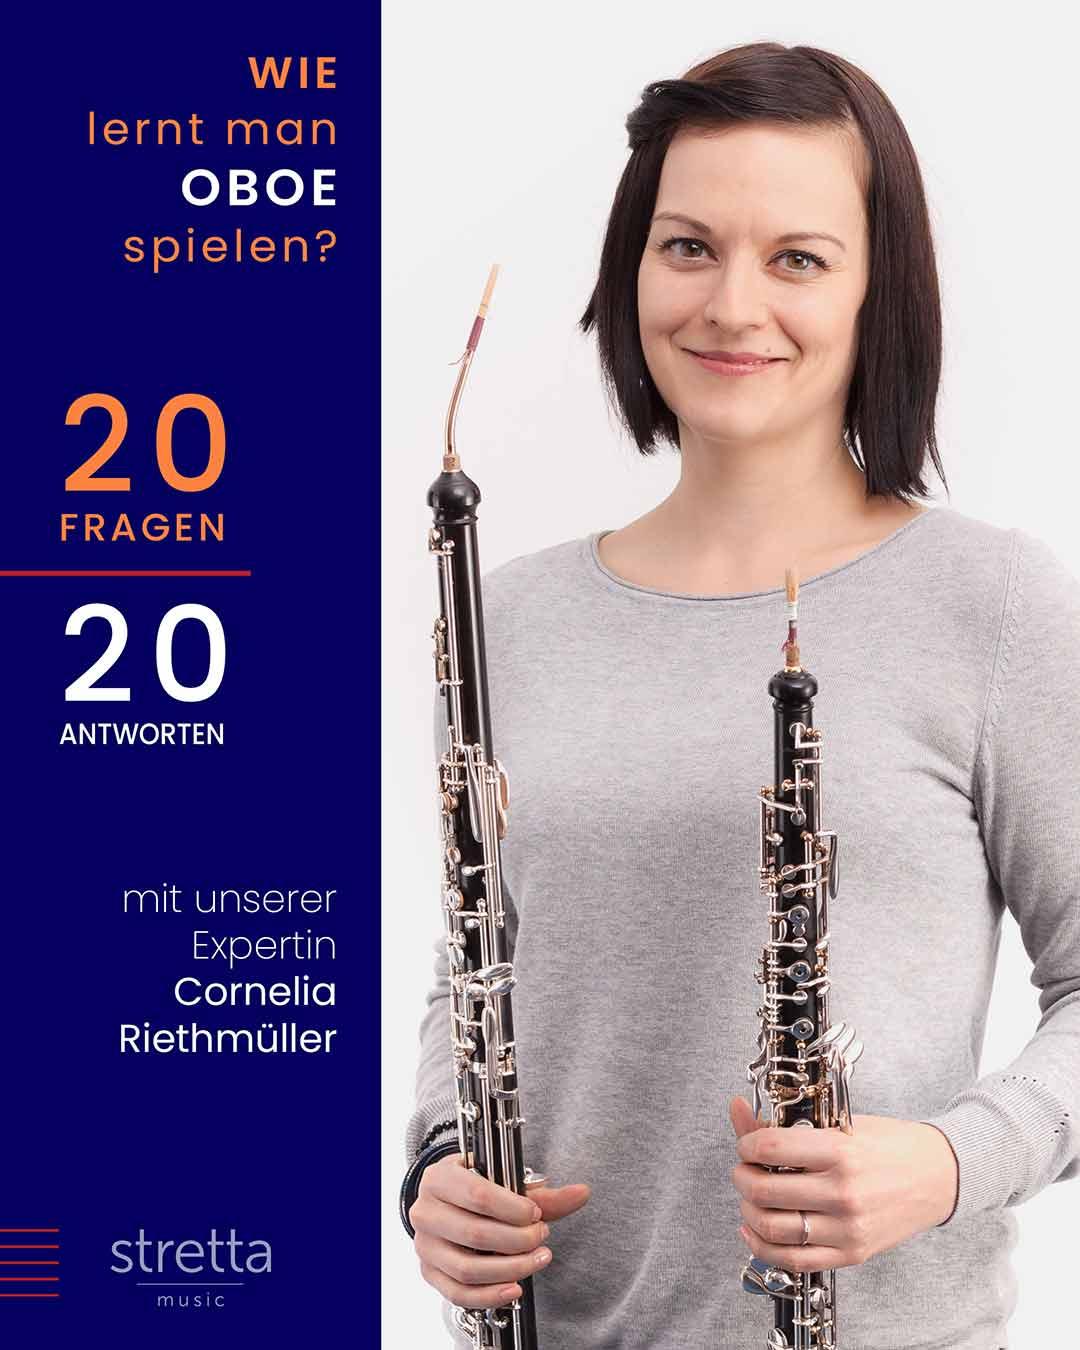 Oboe lernen – 20 Fragen an Cornelia Riethmüller